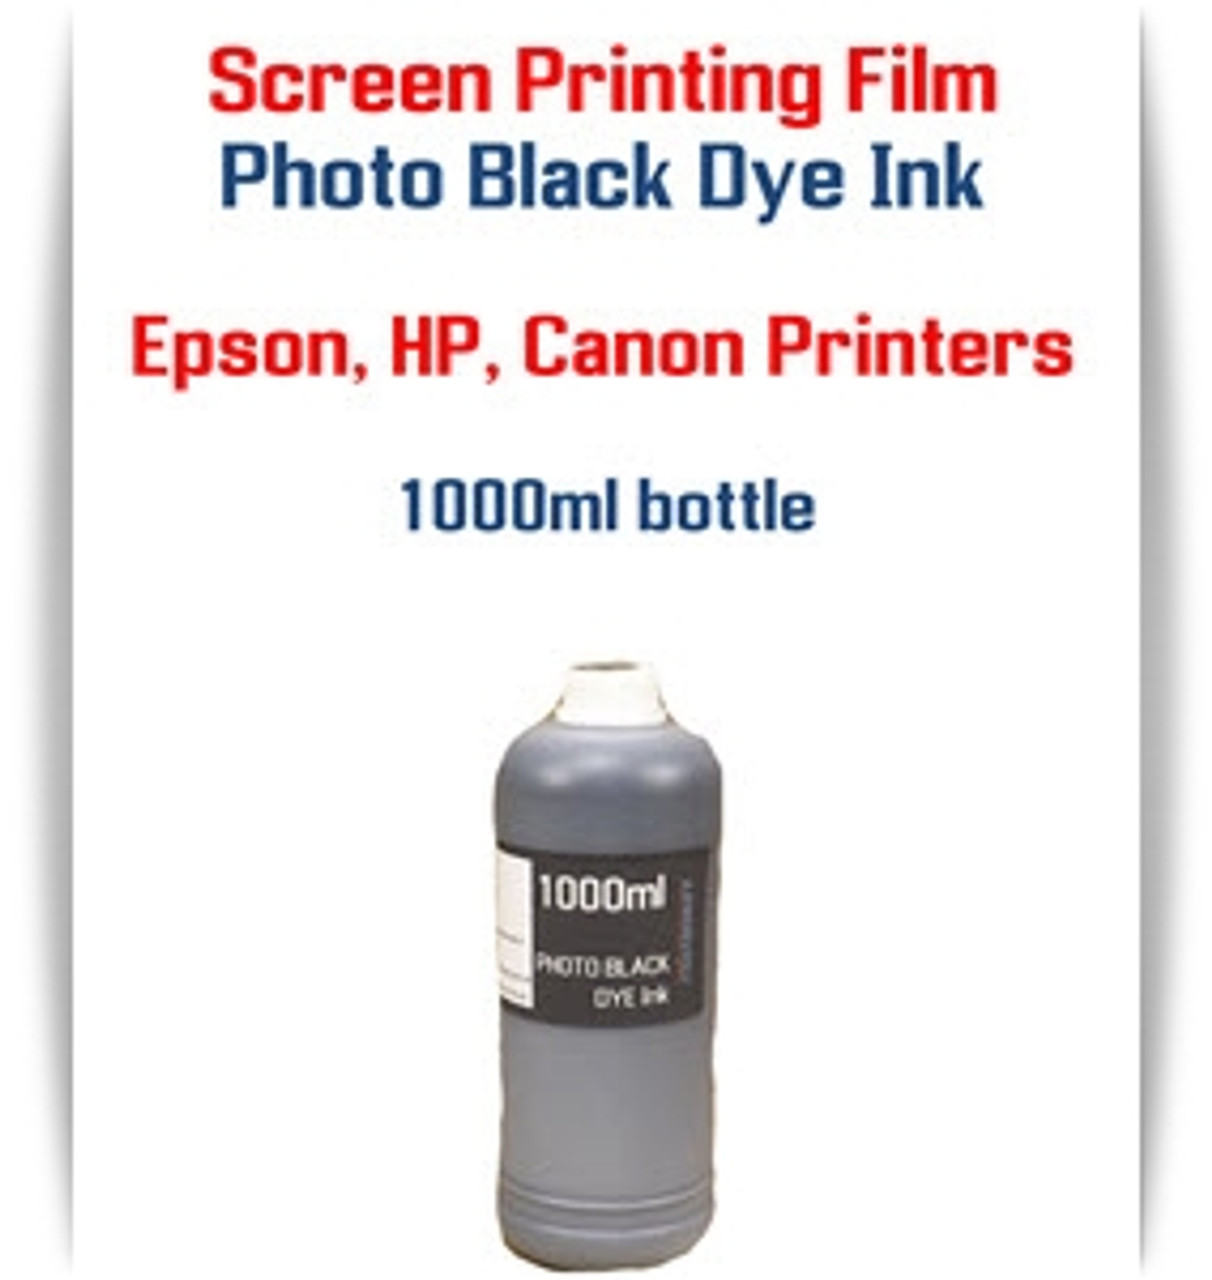 Screen Printing Film Ink Photo Black 1000ml Dye Bottle Ink Epson, HP, Canon printers